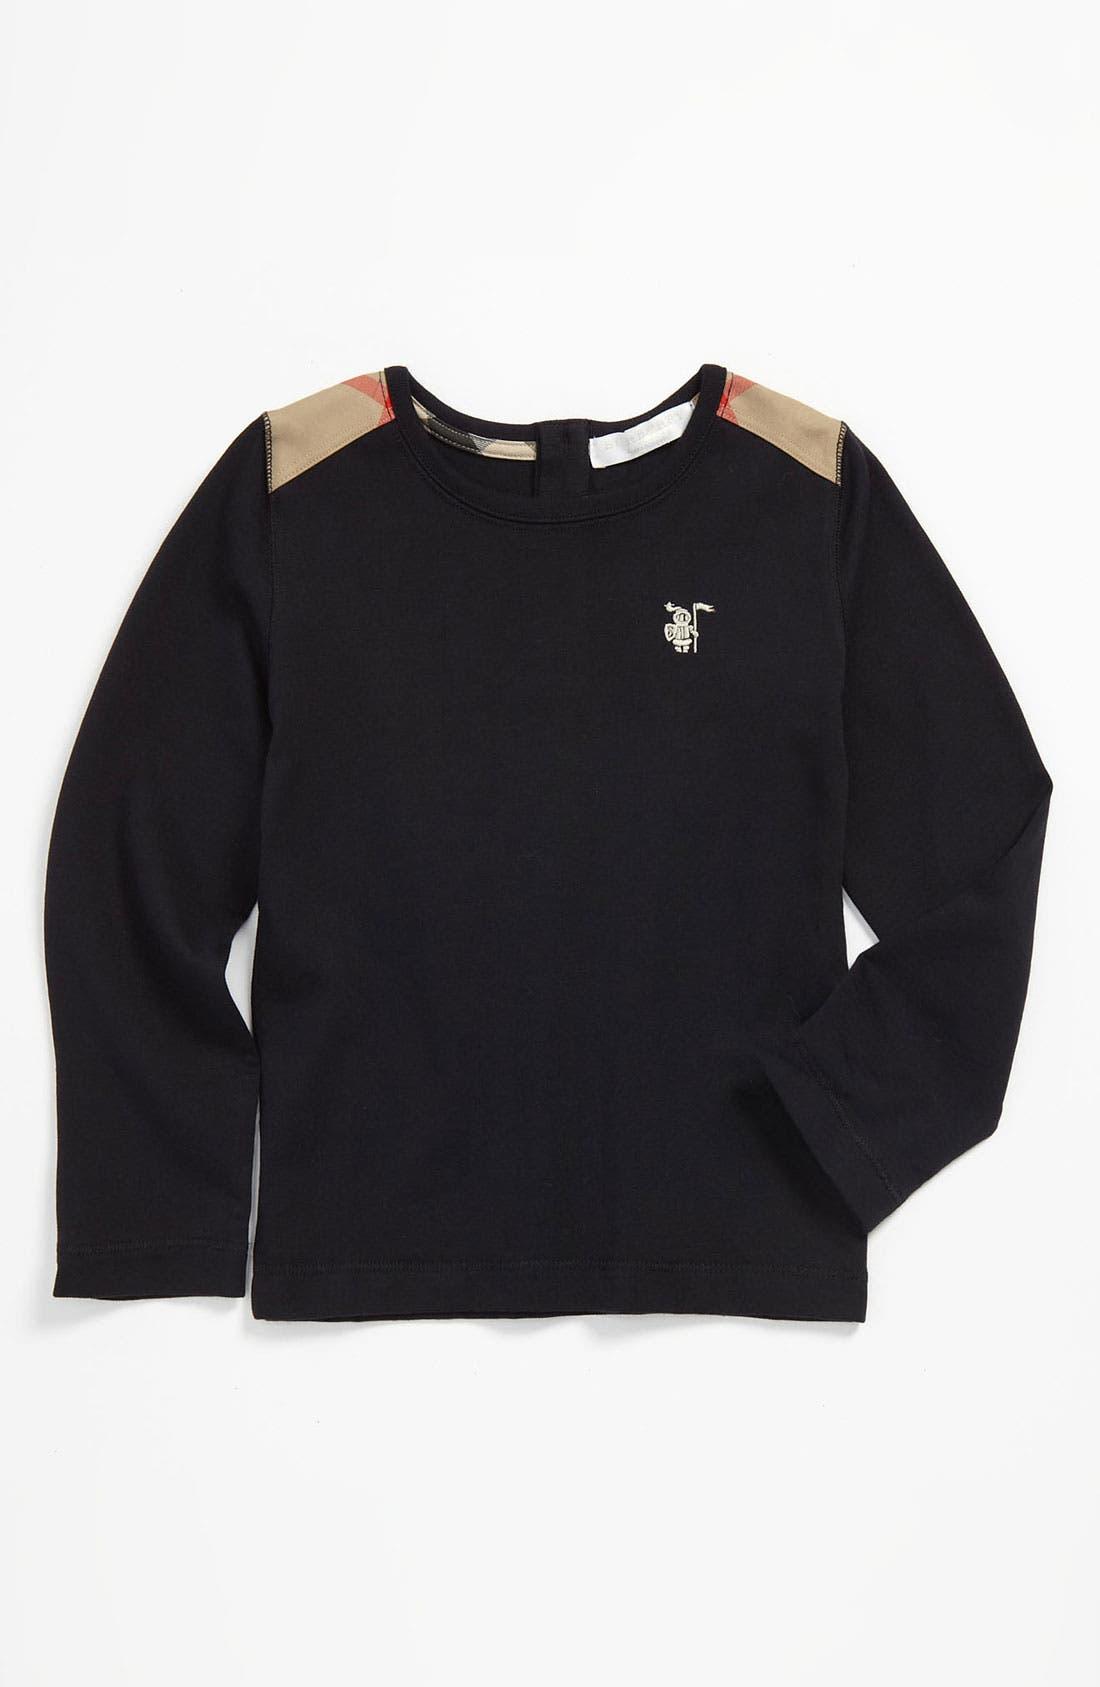 Main Image - Burberry Shoulder Patch T-Shirt (Infant)